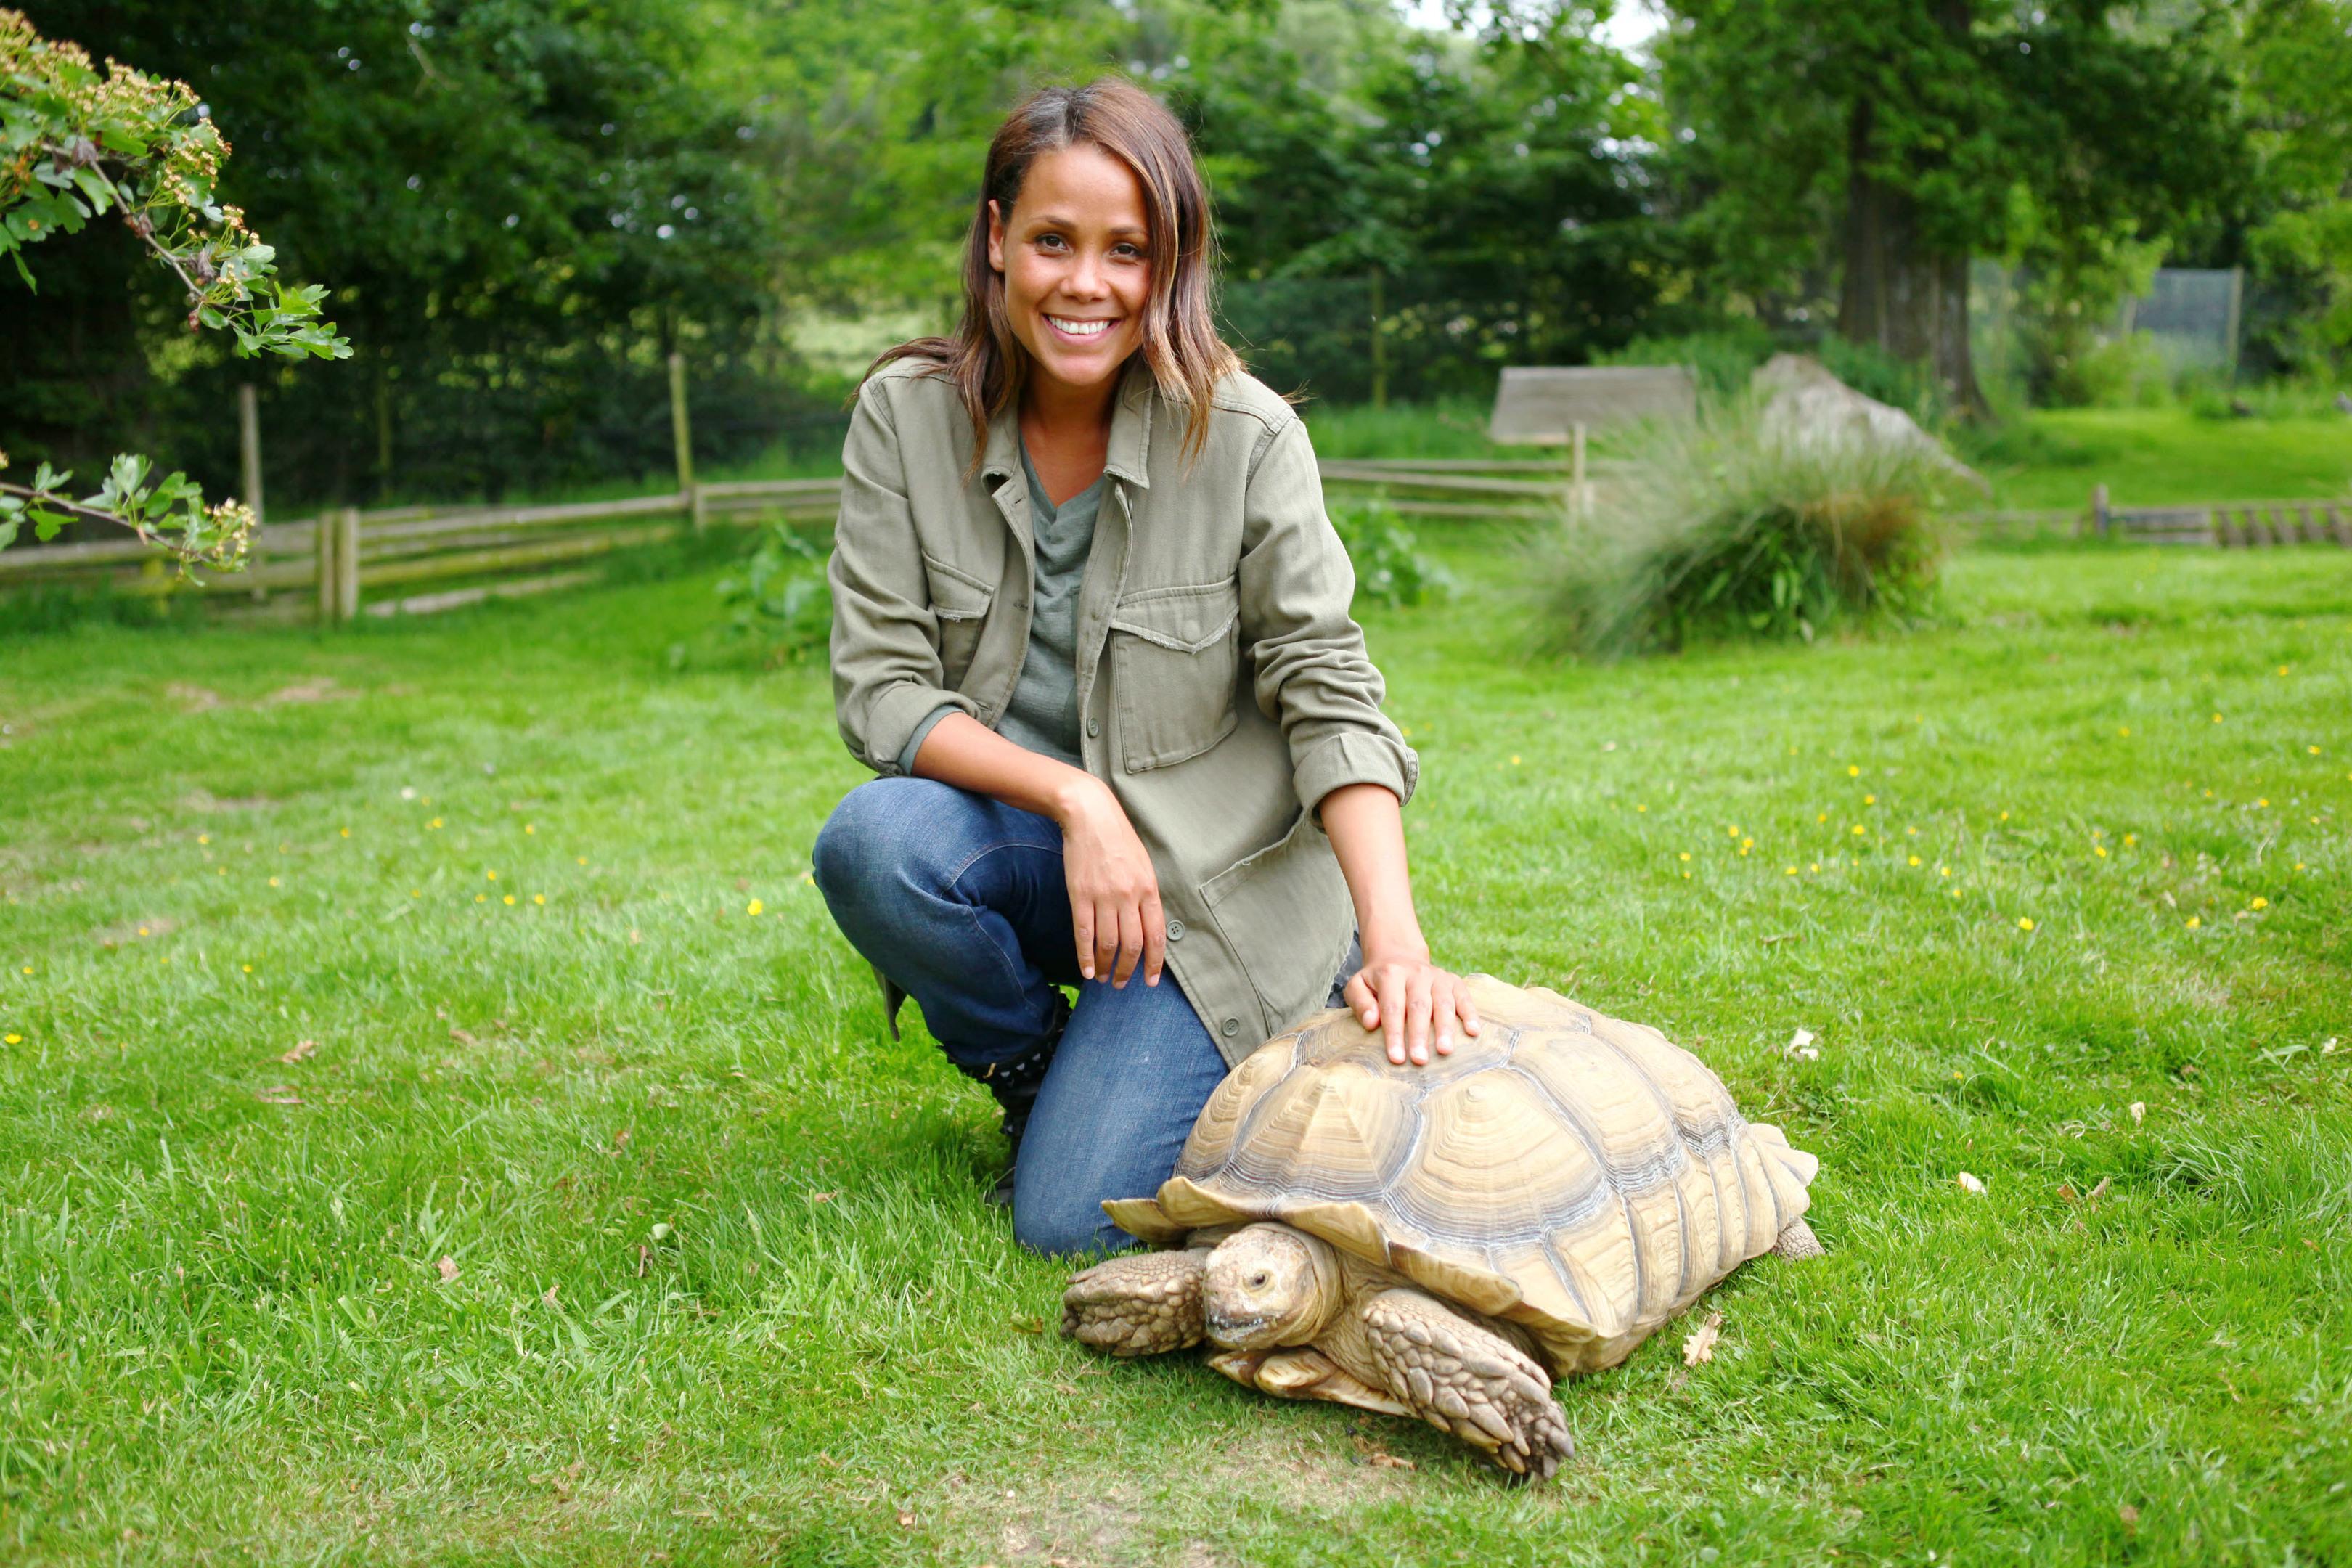 Jean Johansson with an African Spurred Tortoise (BBC/Endemol Shine UK/Joff Wilson)